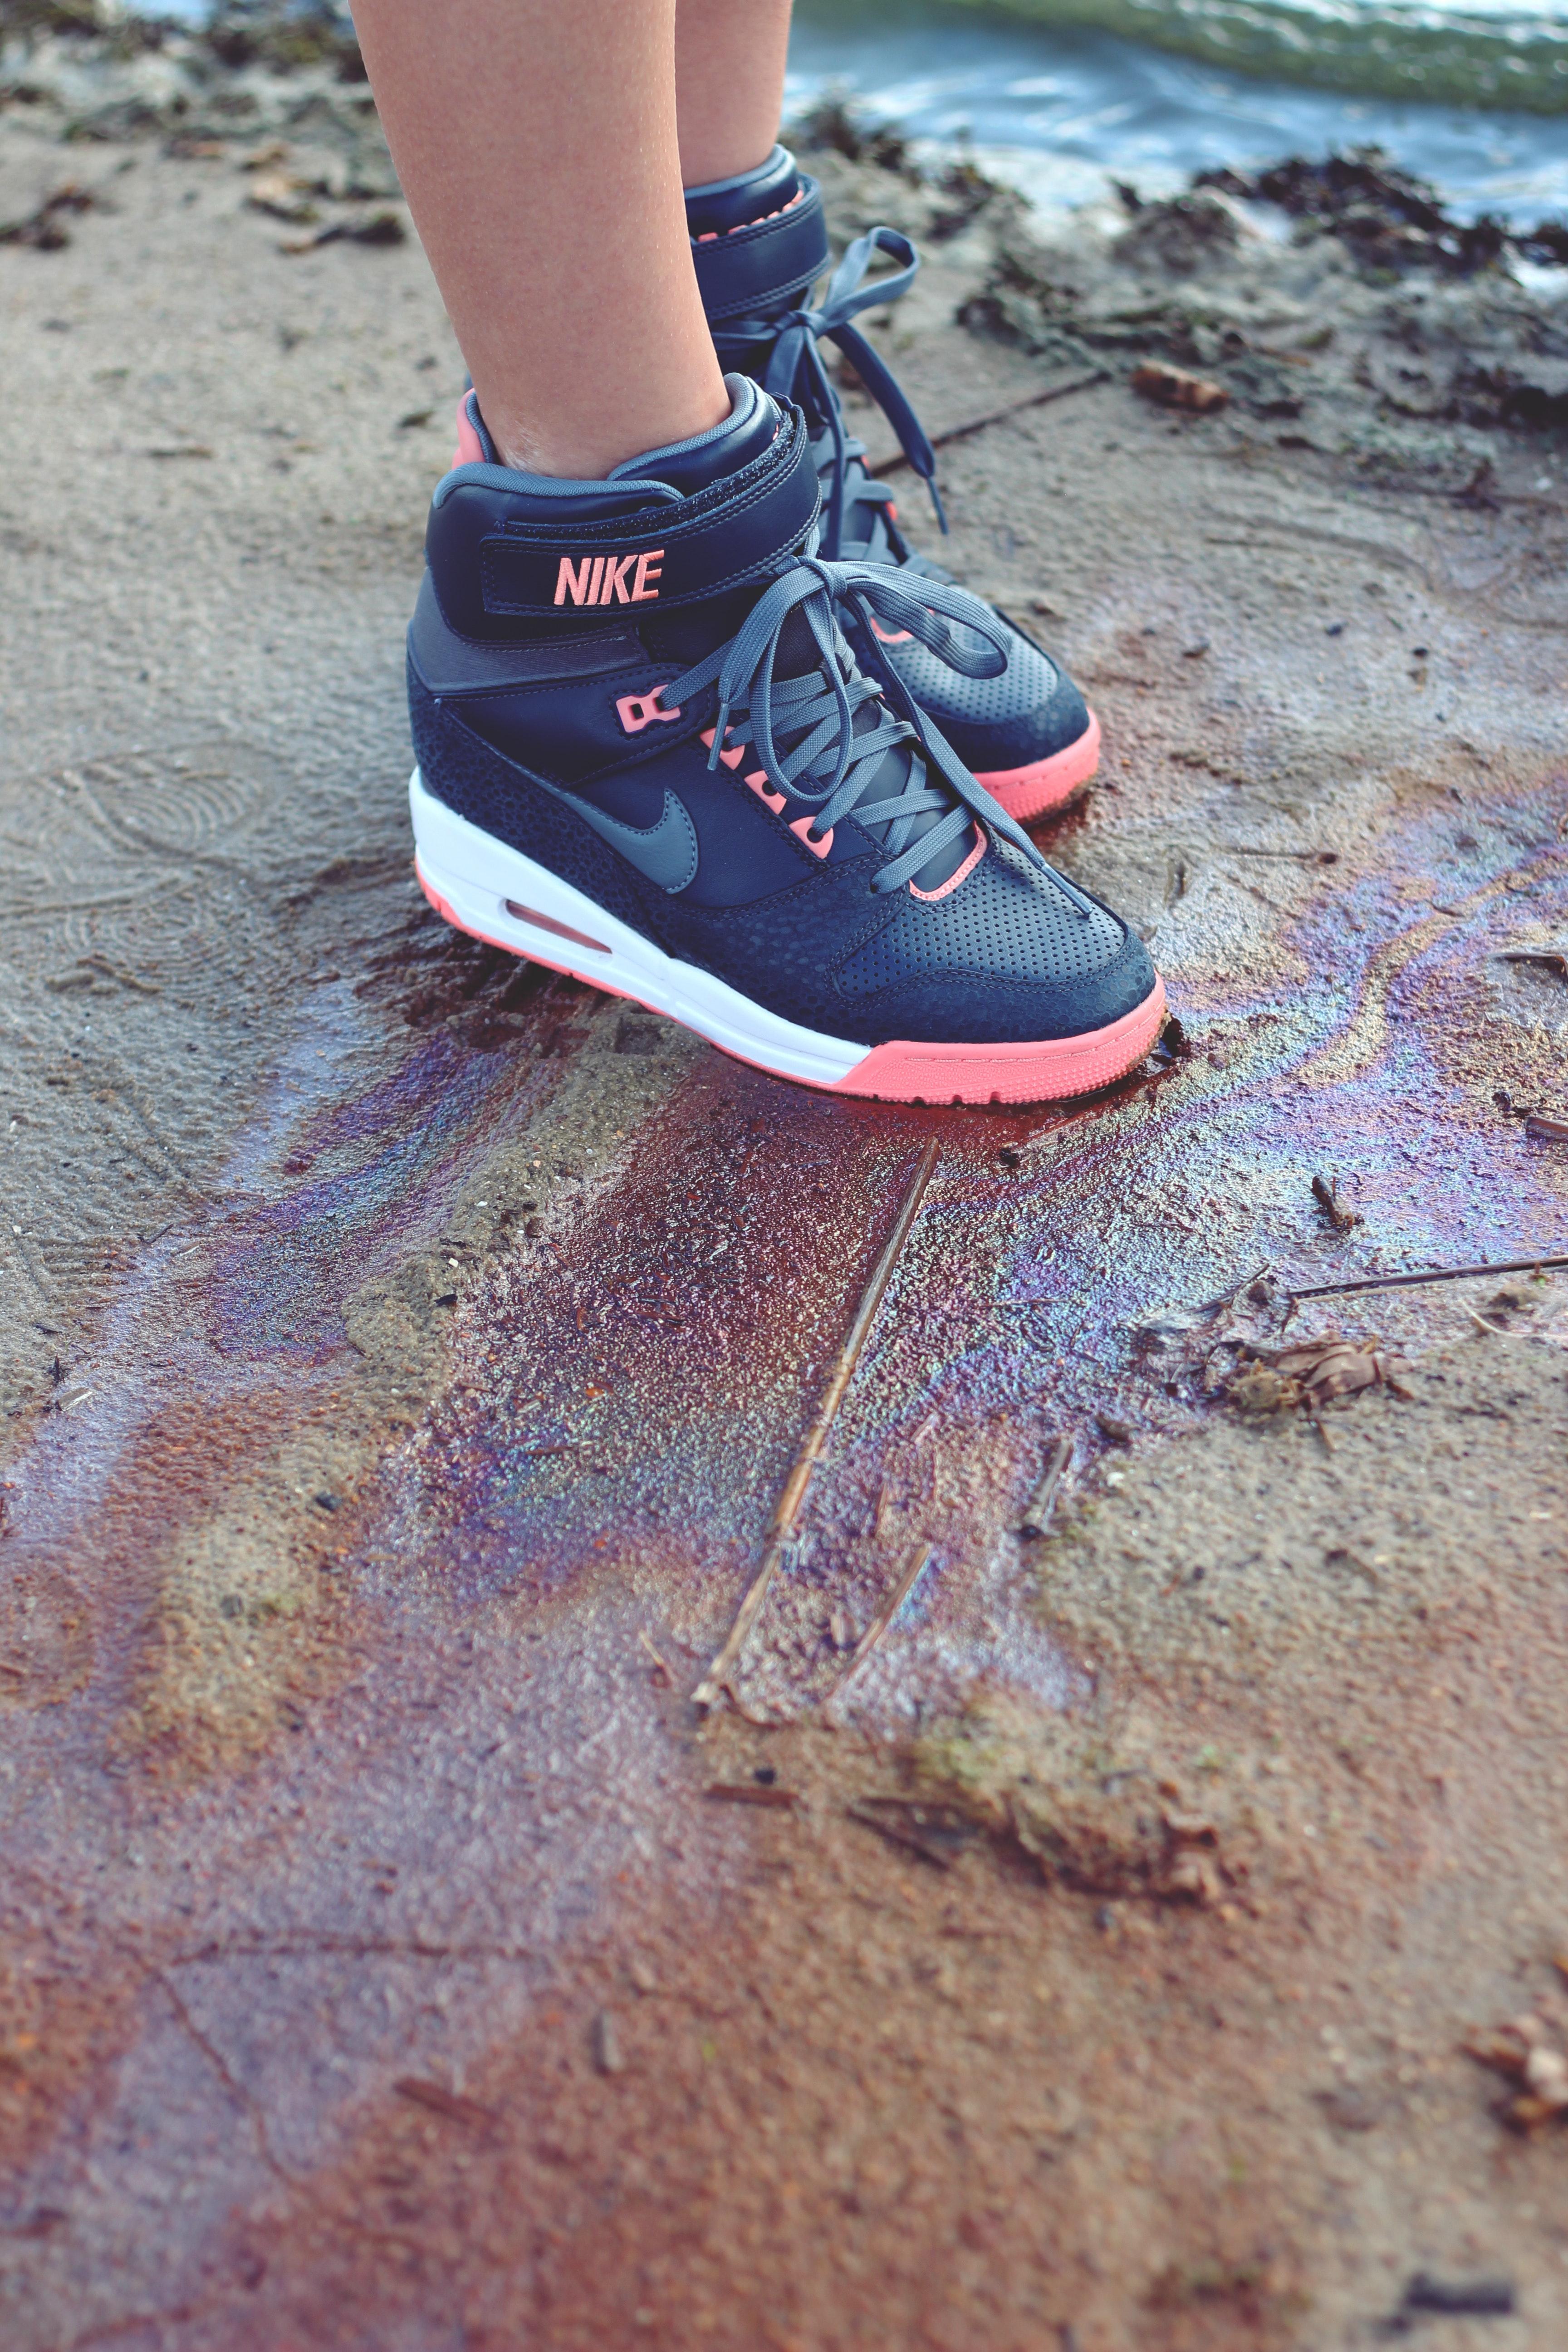 Boots & sand photo